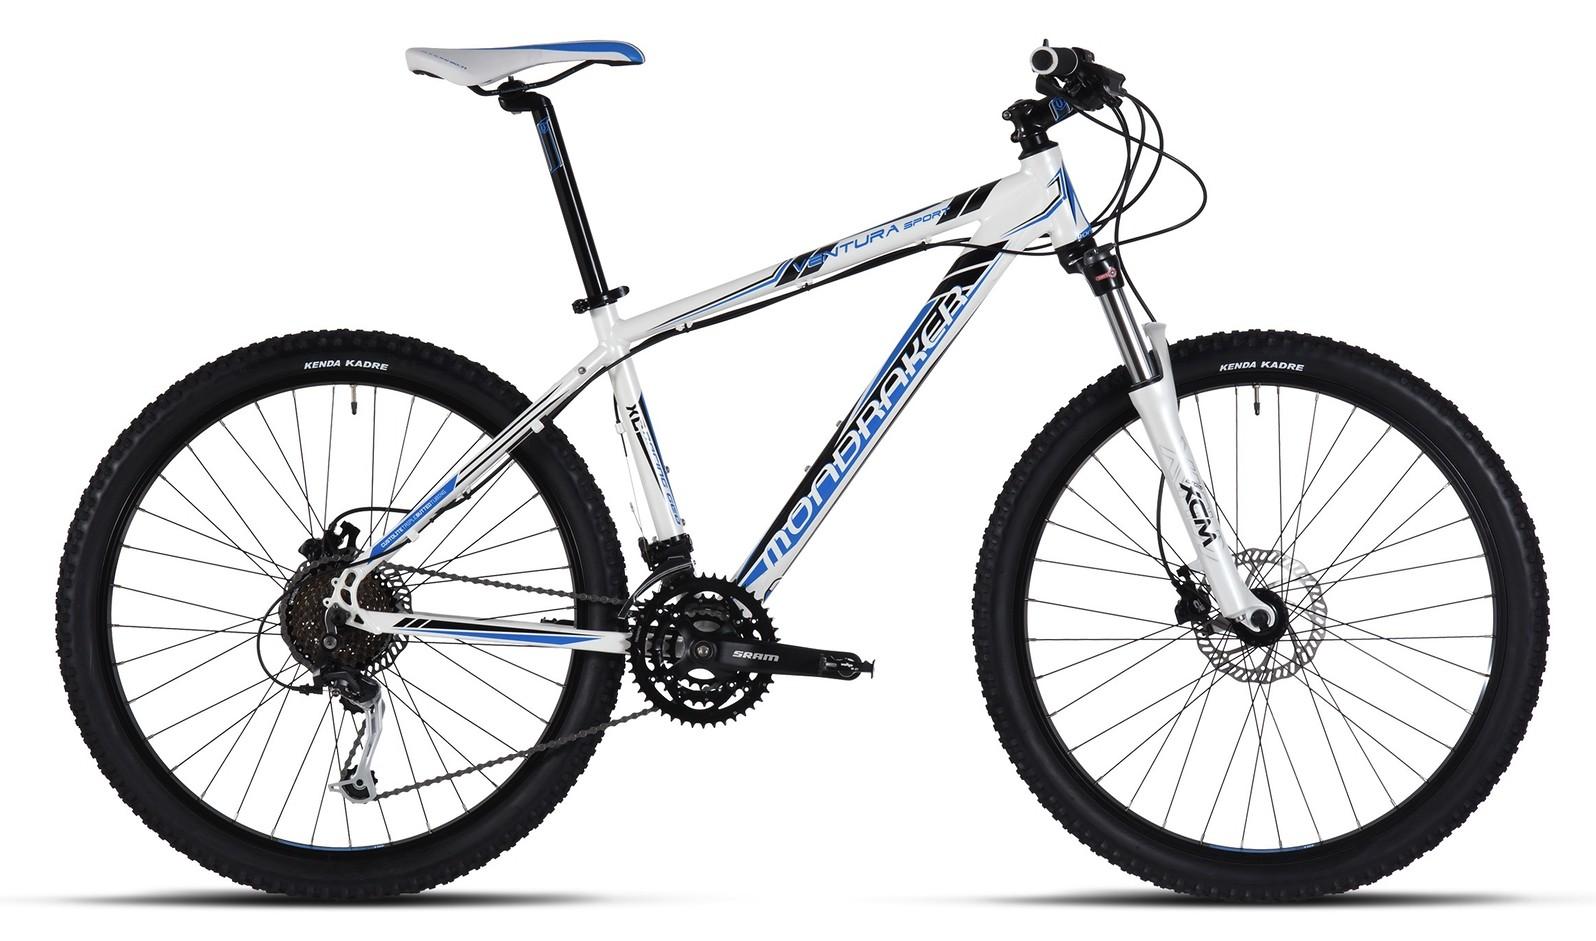 2013 Mondraker Ventura Sport Bike bike - mondraker ventura sport